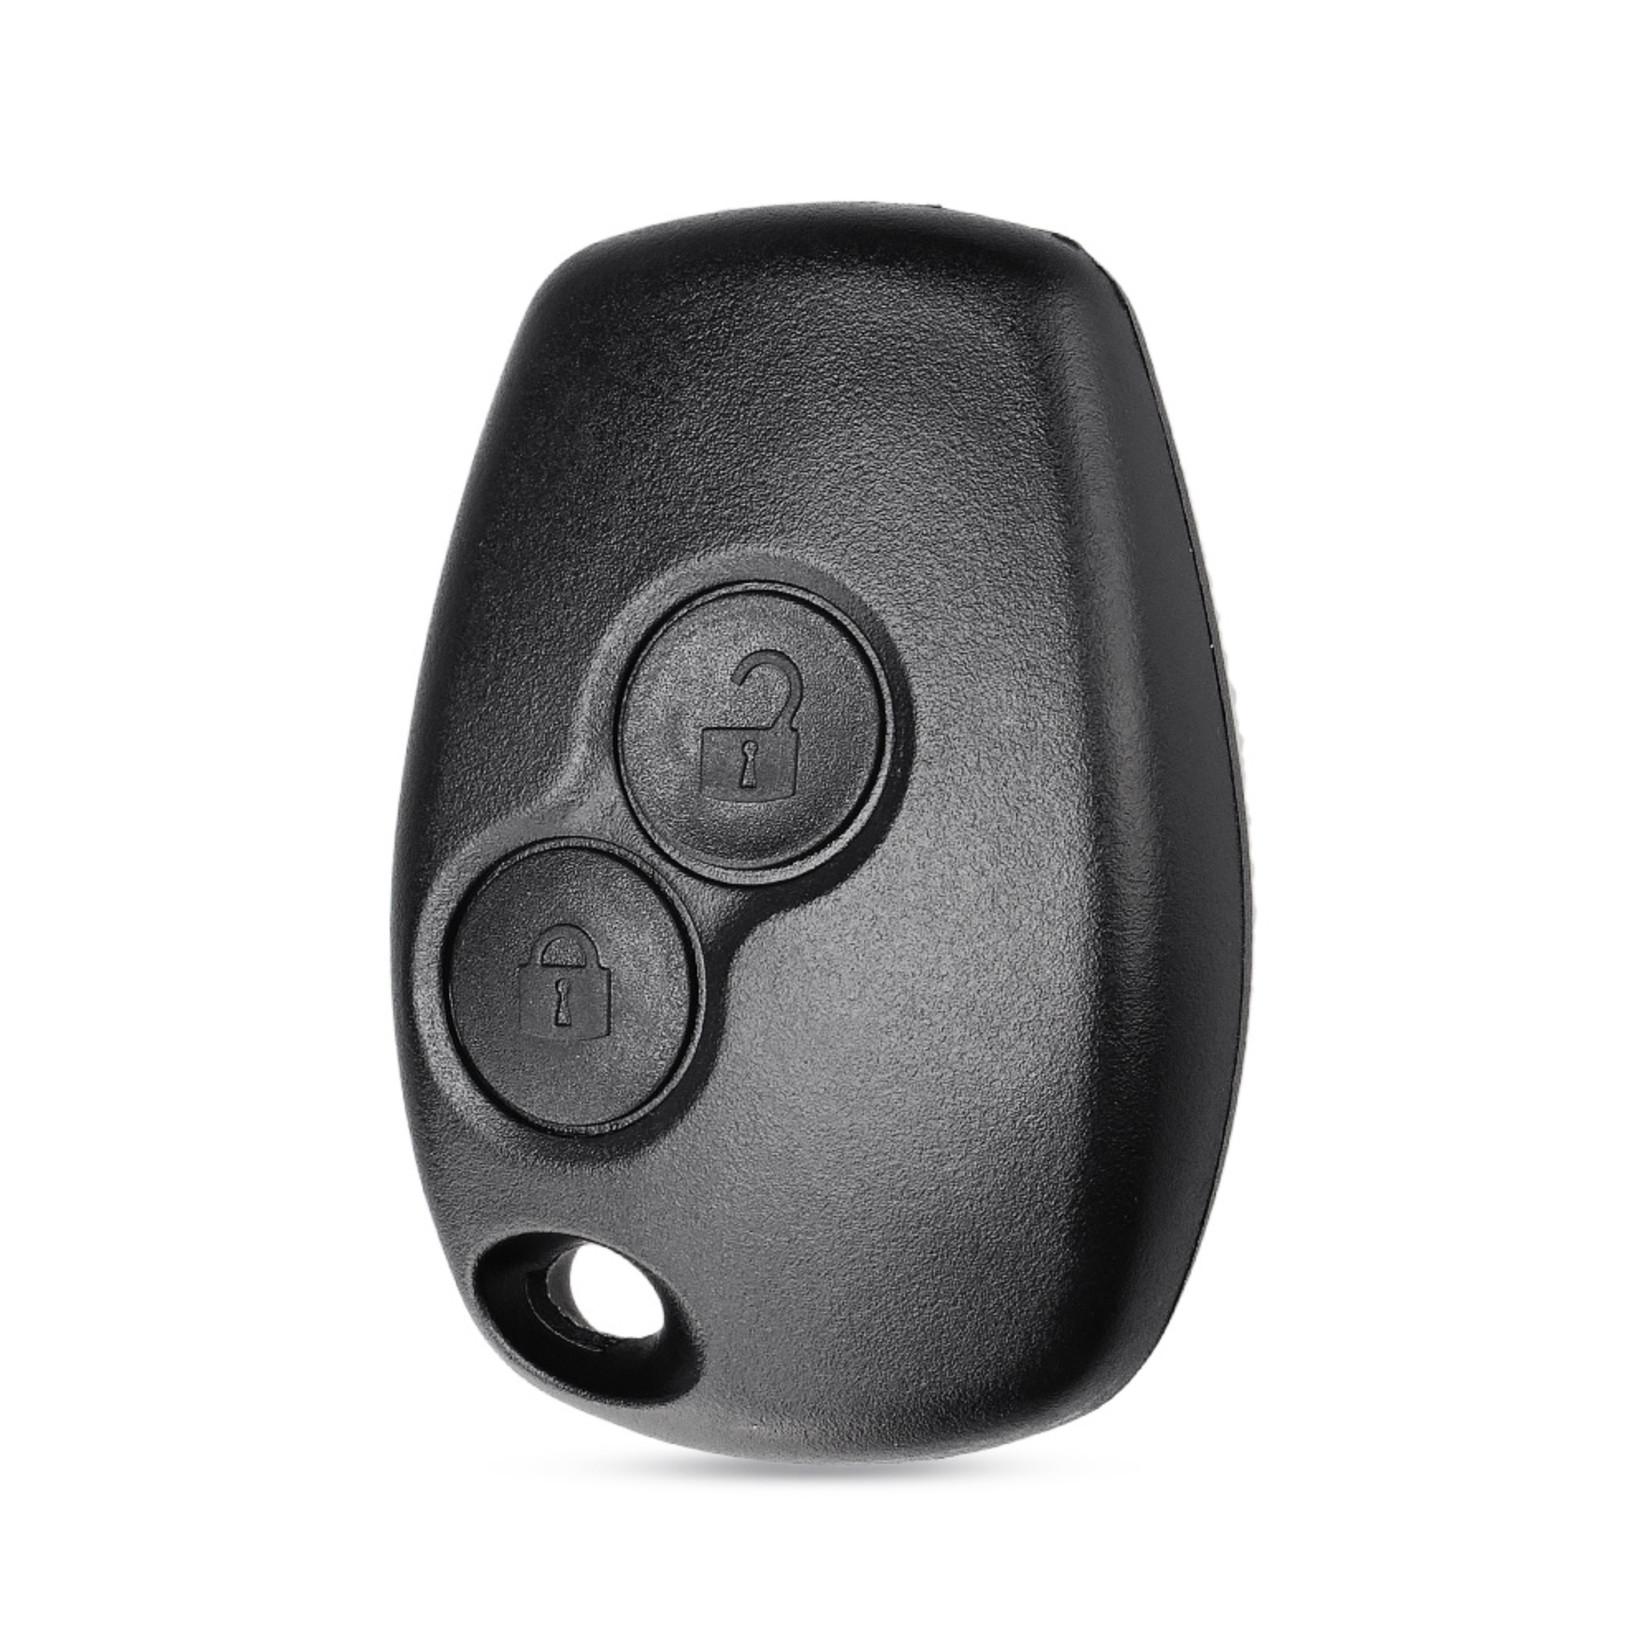 XEOD Renault sleutelbehuizing